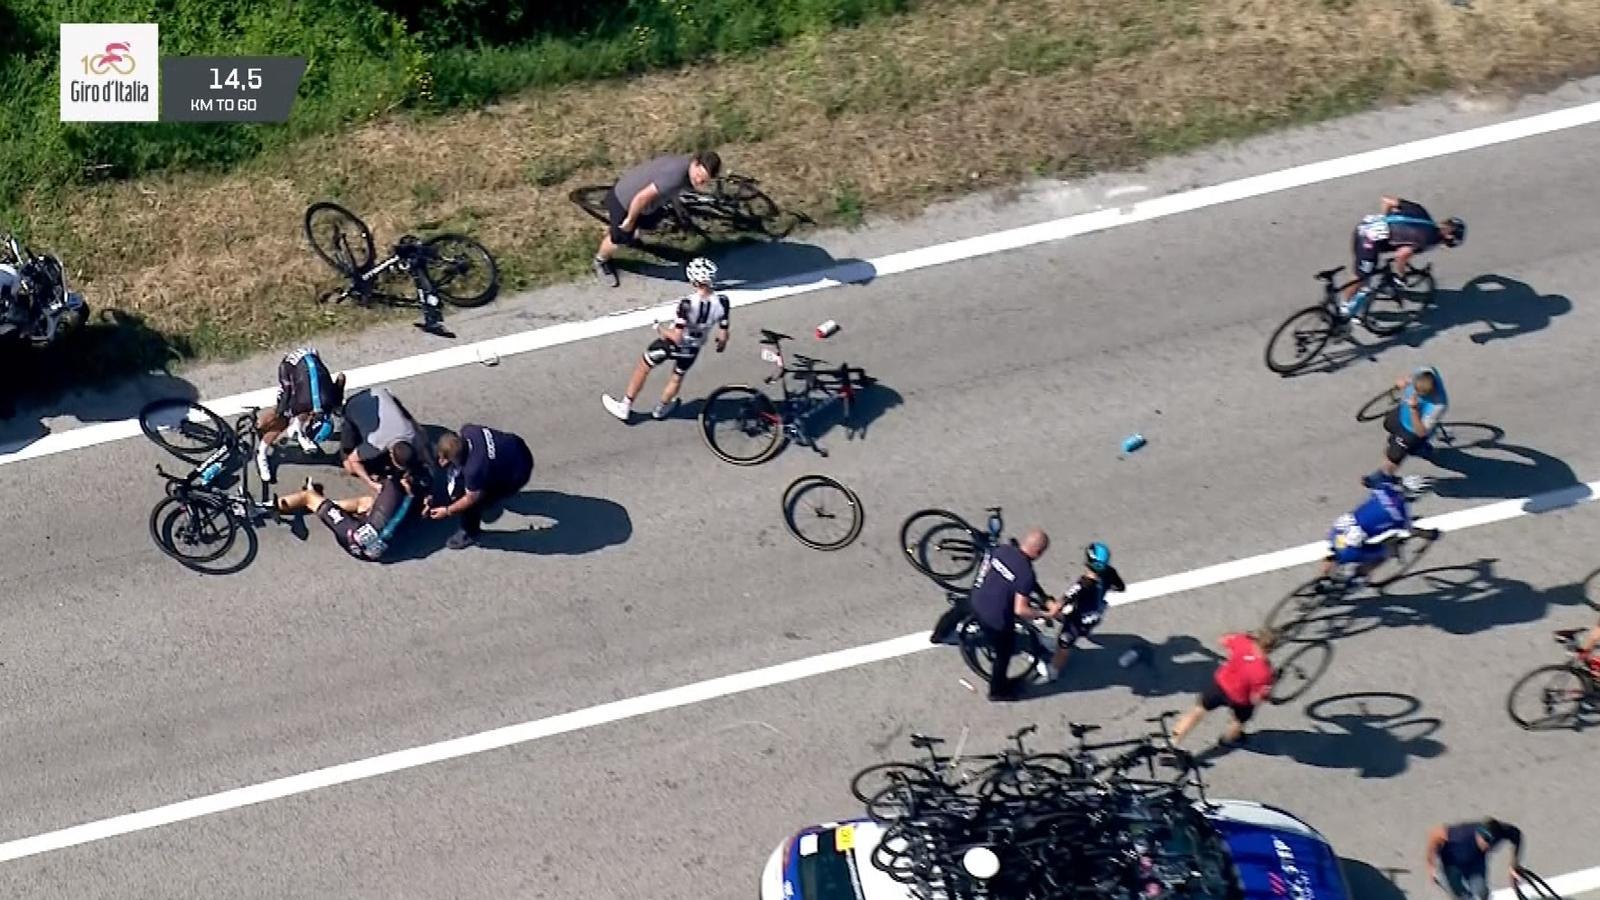 VIDEO - Huge crash with motorbike leaves Team Sky hopes in tatters - Giro d'Italia - Video Eurosport